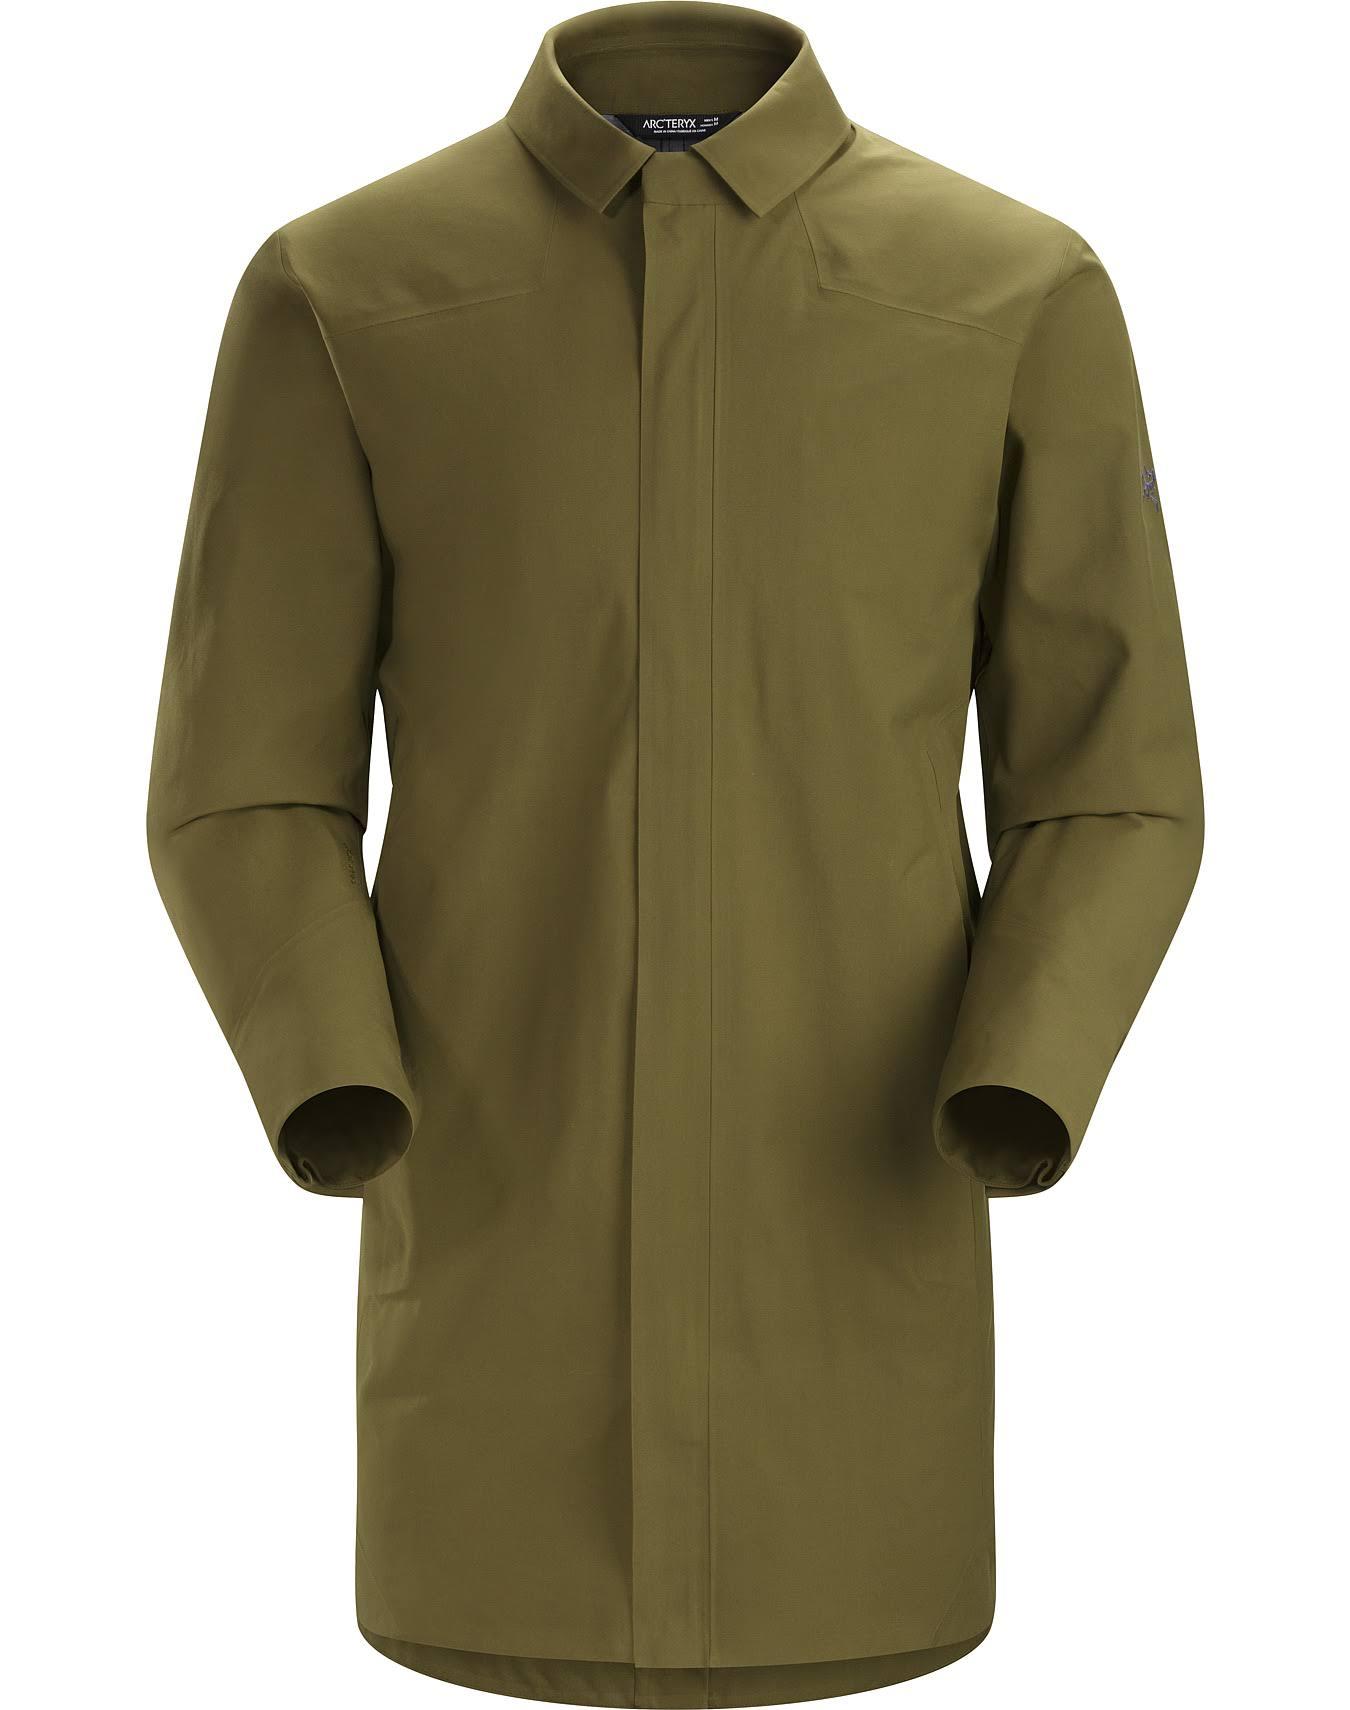 Hombre De Moss Para Trench Otoño Small Discontinuos 2017 Moss Colores Keppel Coat Dark Arc'teryx 0fHIxt